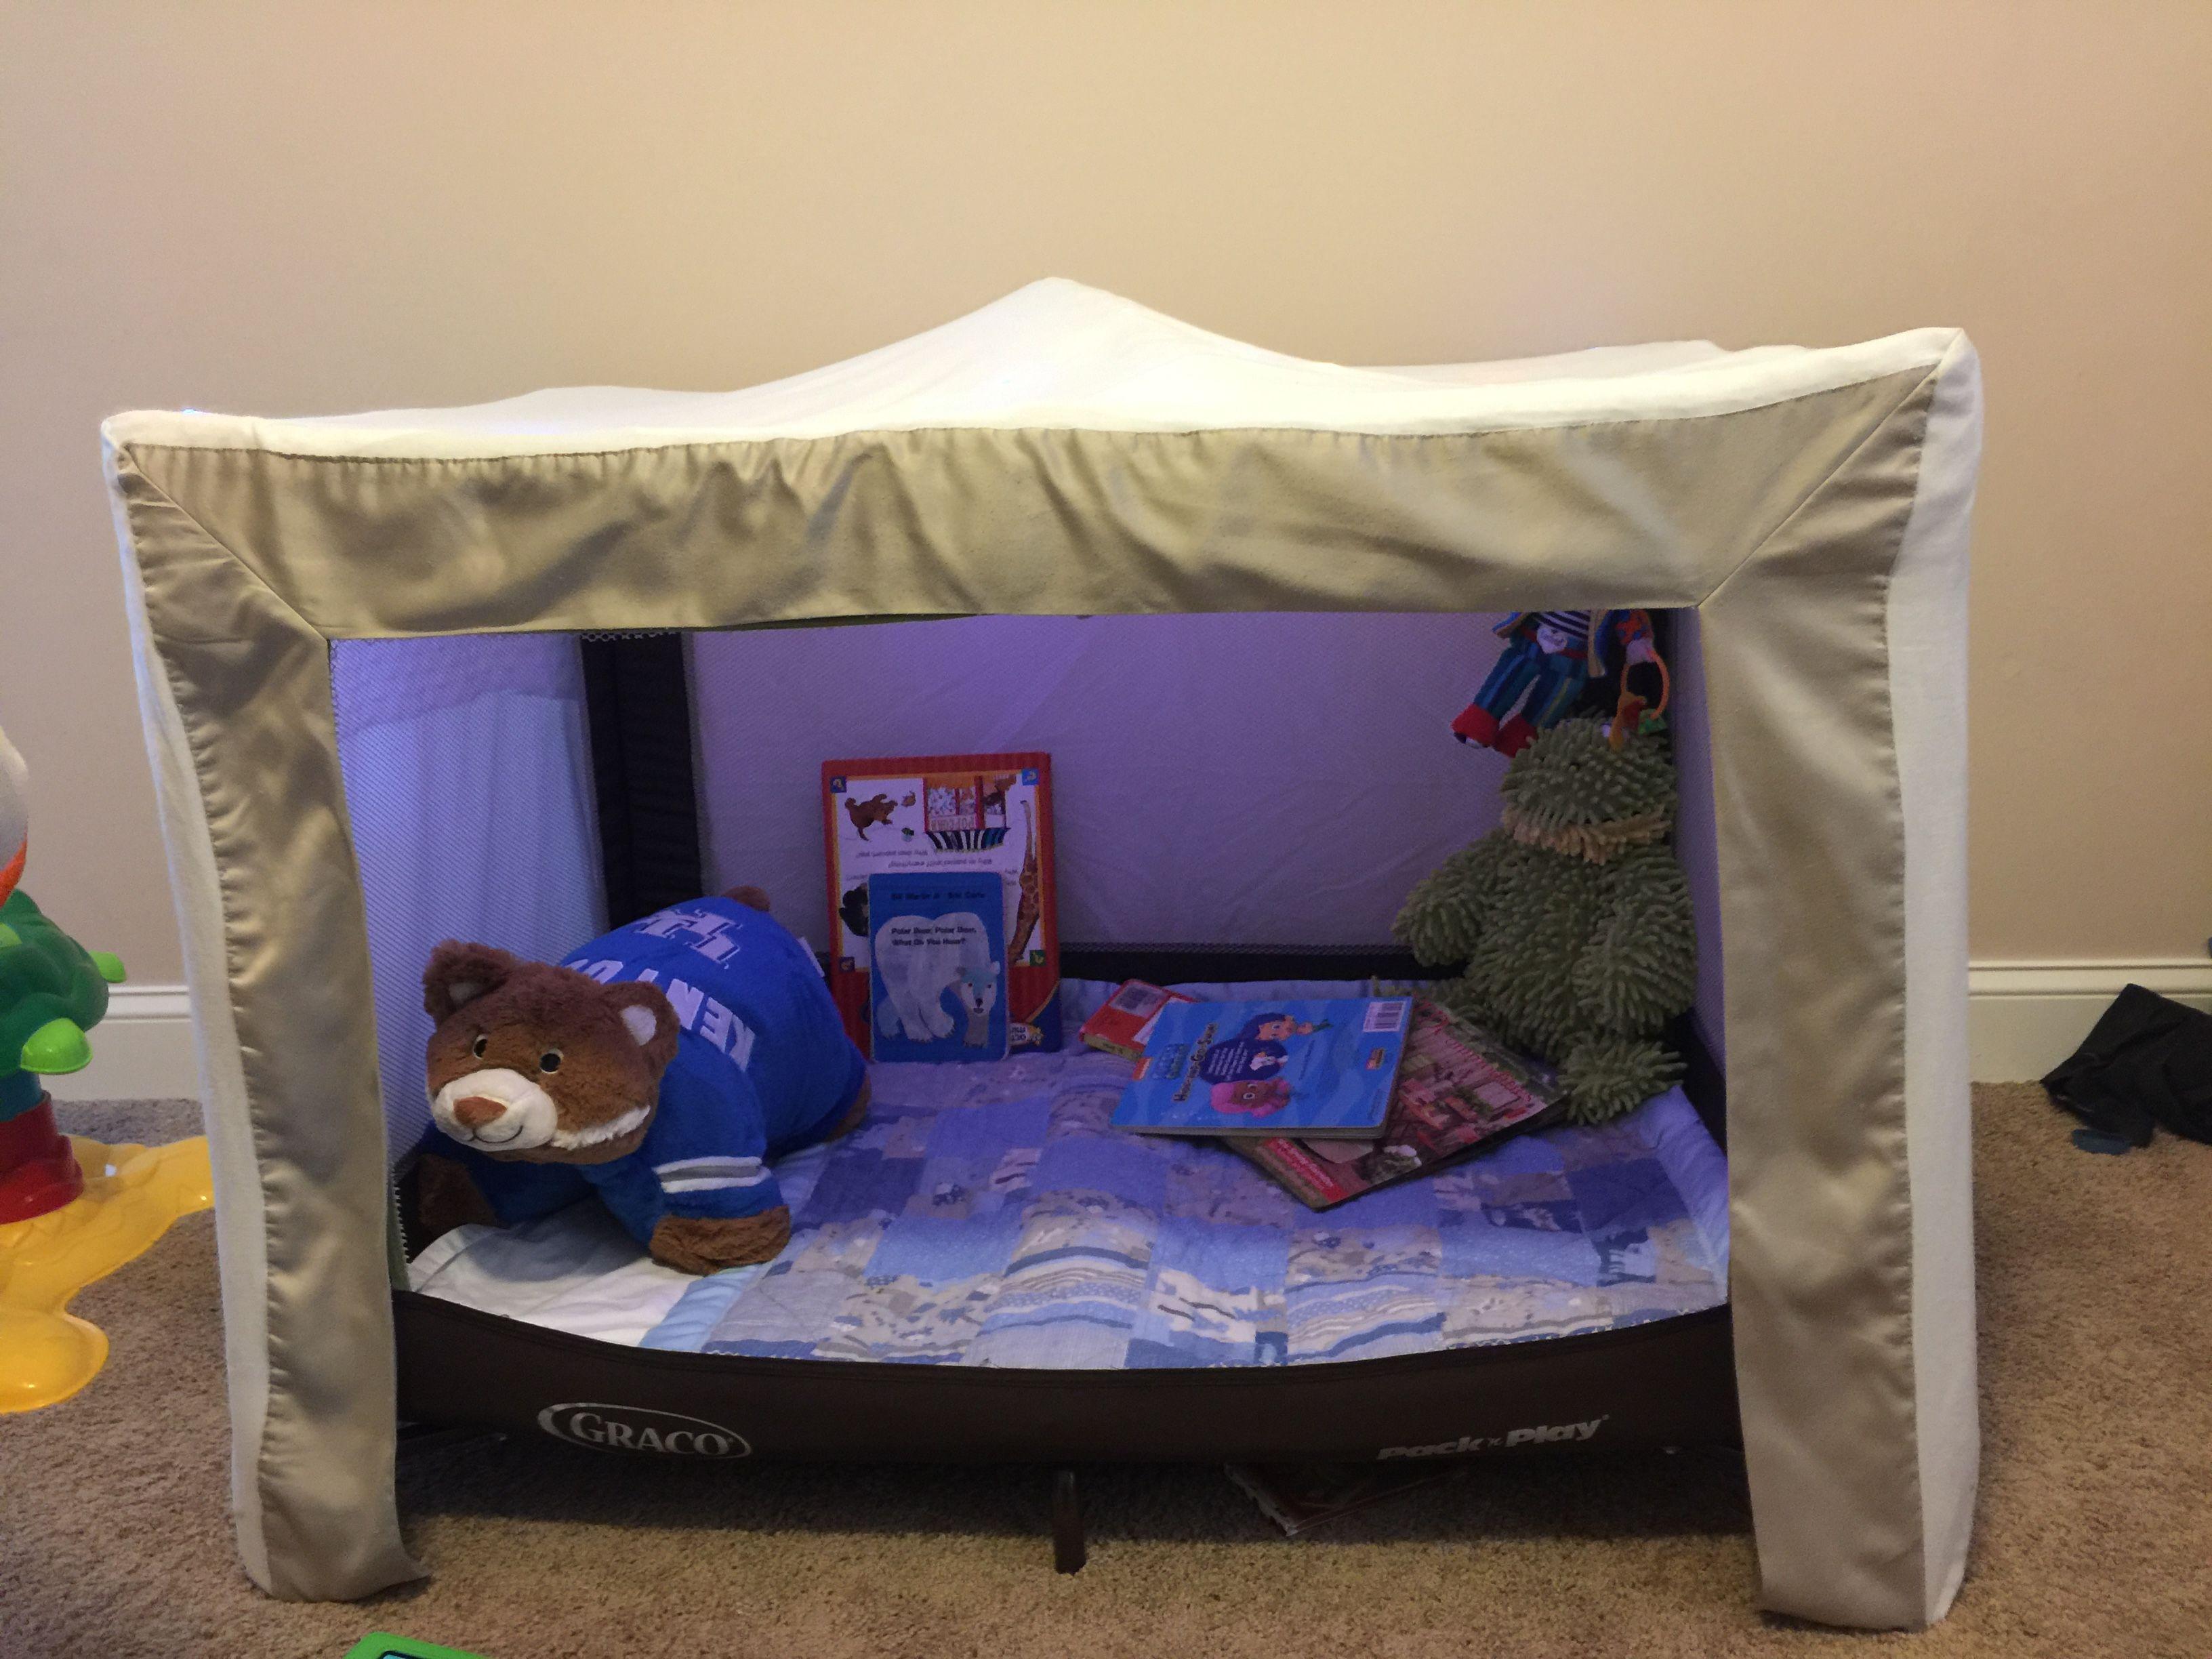 Cozy Portable Playard Tent Cabana Kit Indoor Outdoor Baby Play & Portable Playard Tent Plus Cabana Kit - Best Tent 2018